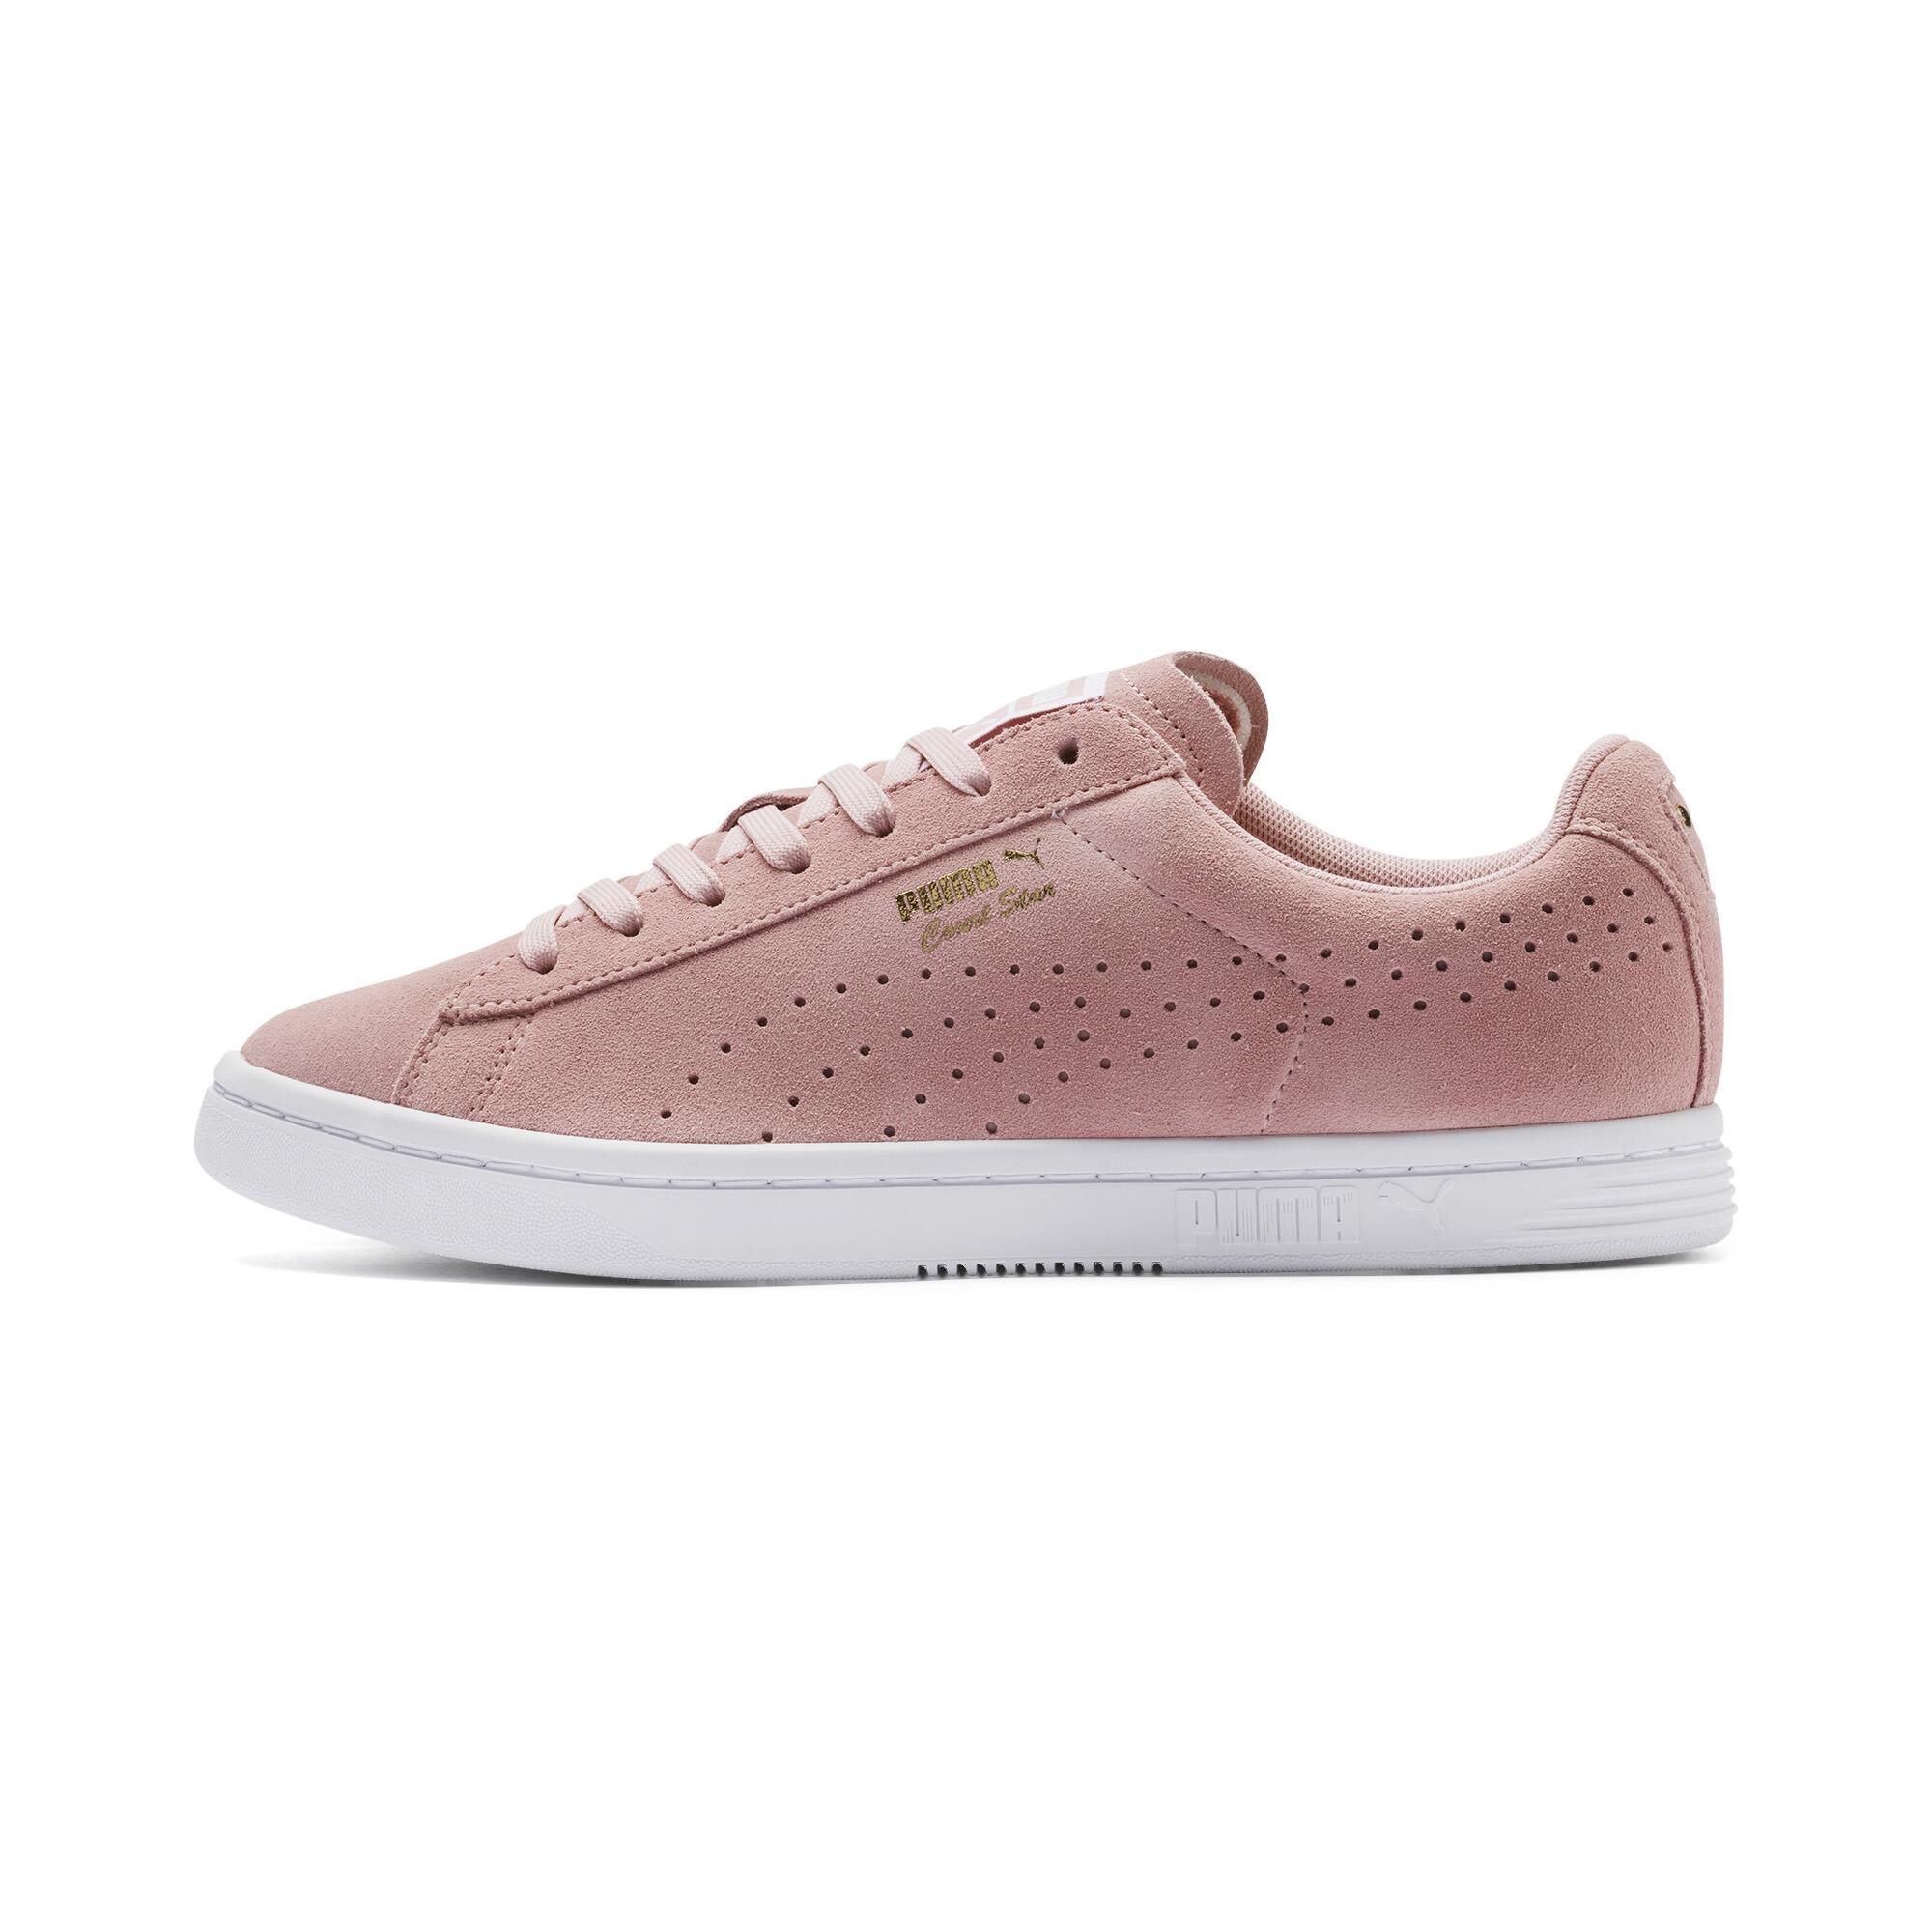 PUMA-Court-Star-Suede-Sneakers-Unisex-Shoe-Sport-Classics thumbnail 4